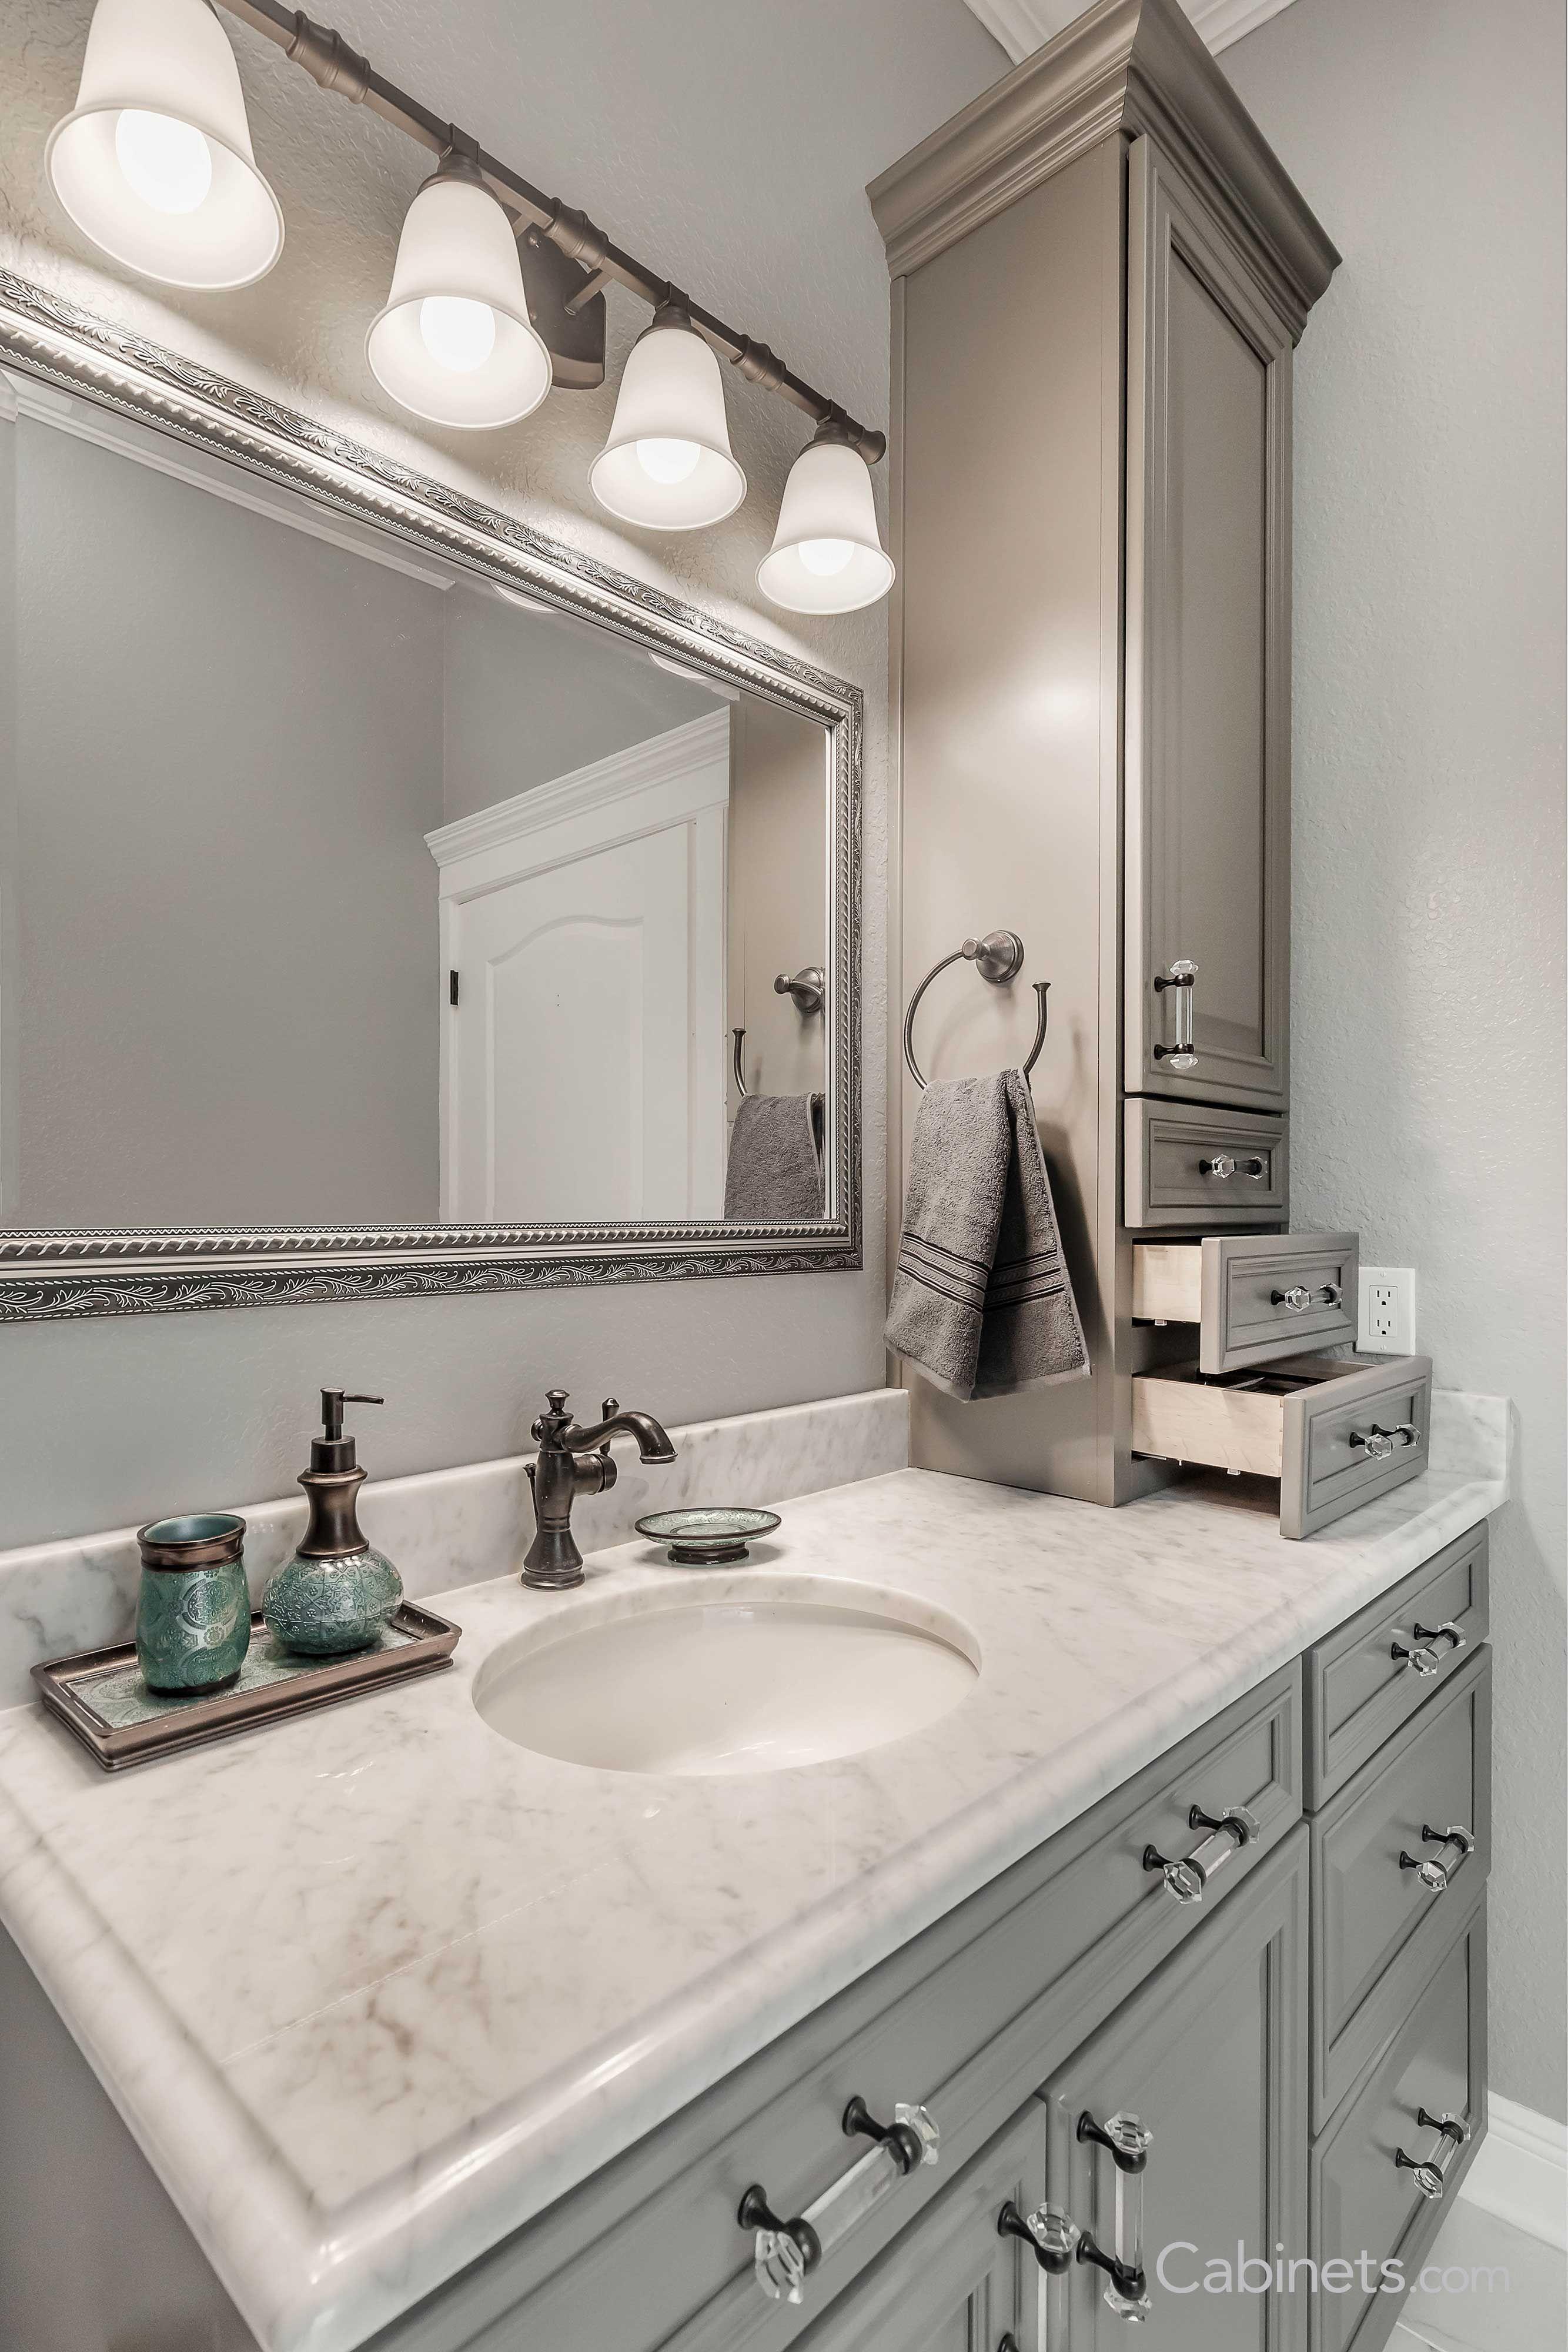 Stunning Elegant Bathroom Featuring Our Bronson Maple Creek Stone Cabinets Bathroom Vanity Designs Grey Kitchen Cabinets Kitchen Cabinets Makeover